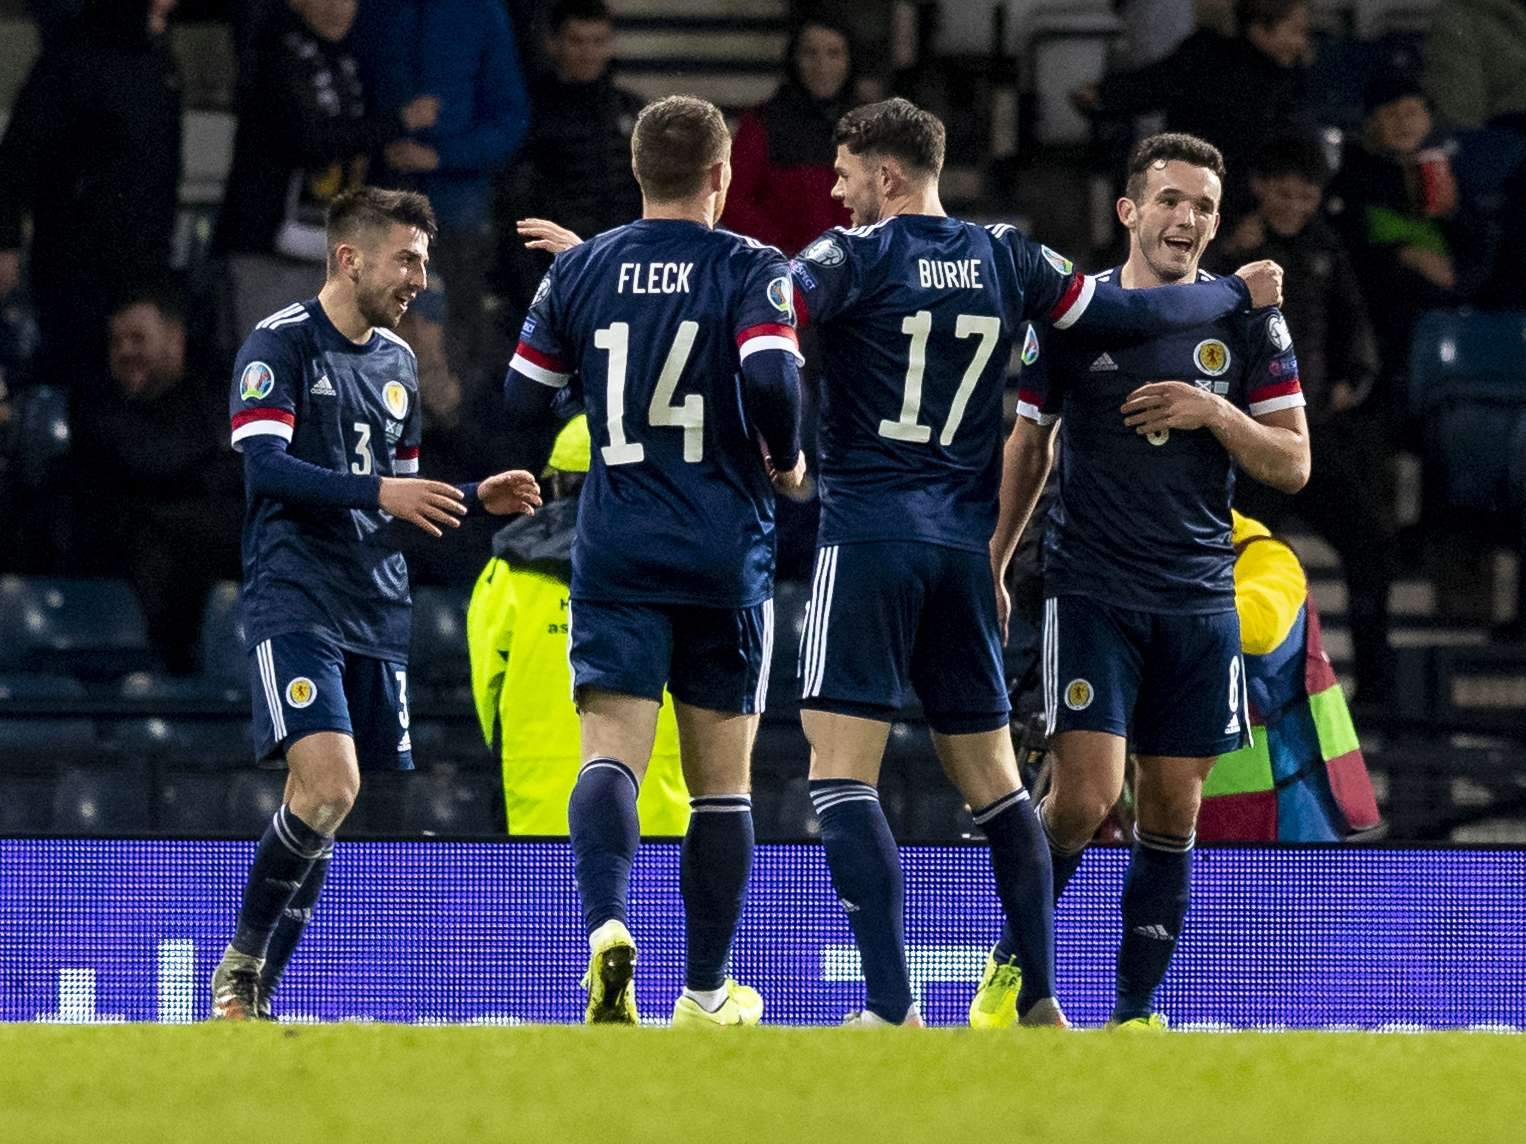 Дания – Шотландия: прогноз на матч отборочного цикла чемпионата мира-2022 - 1 сентября 2021